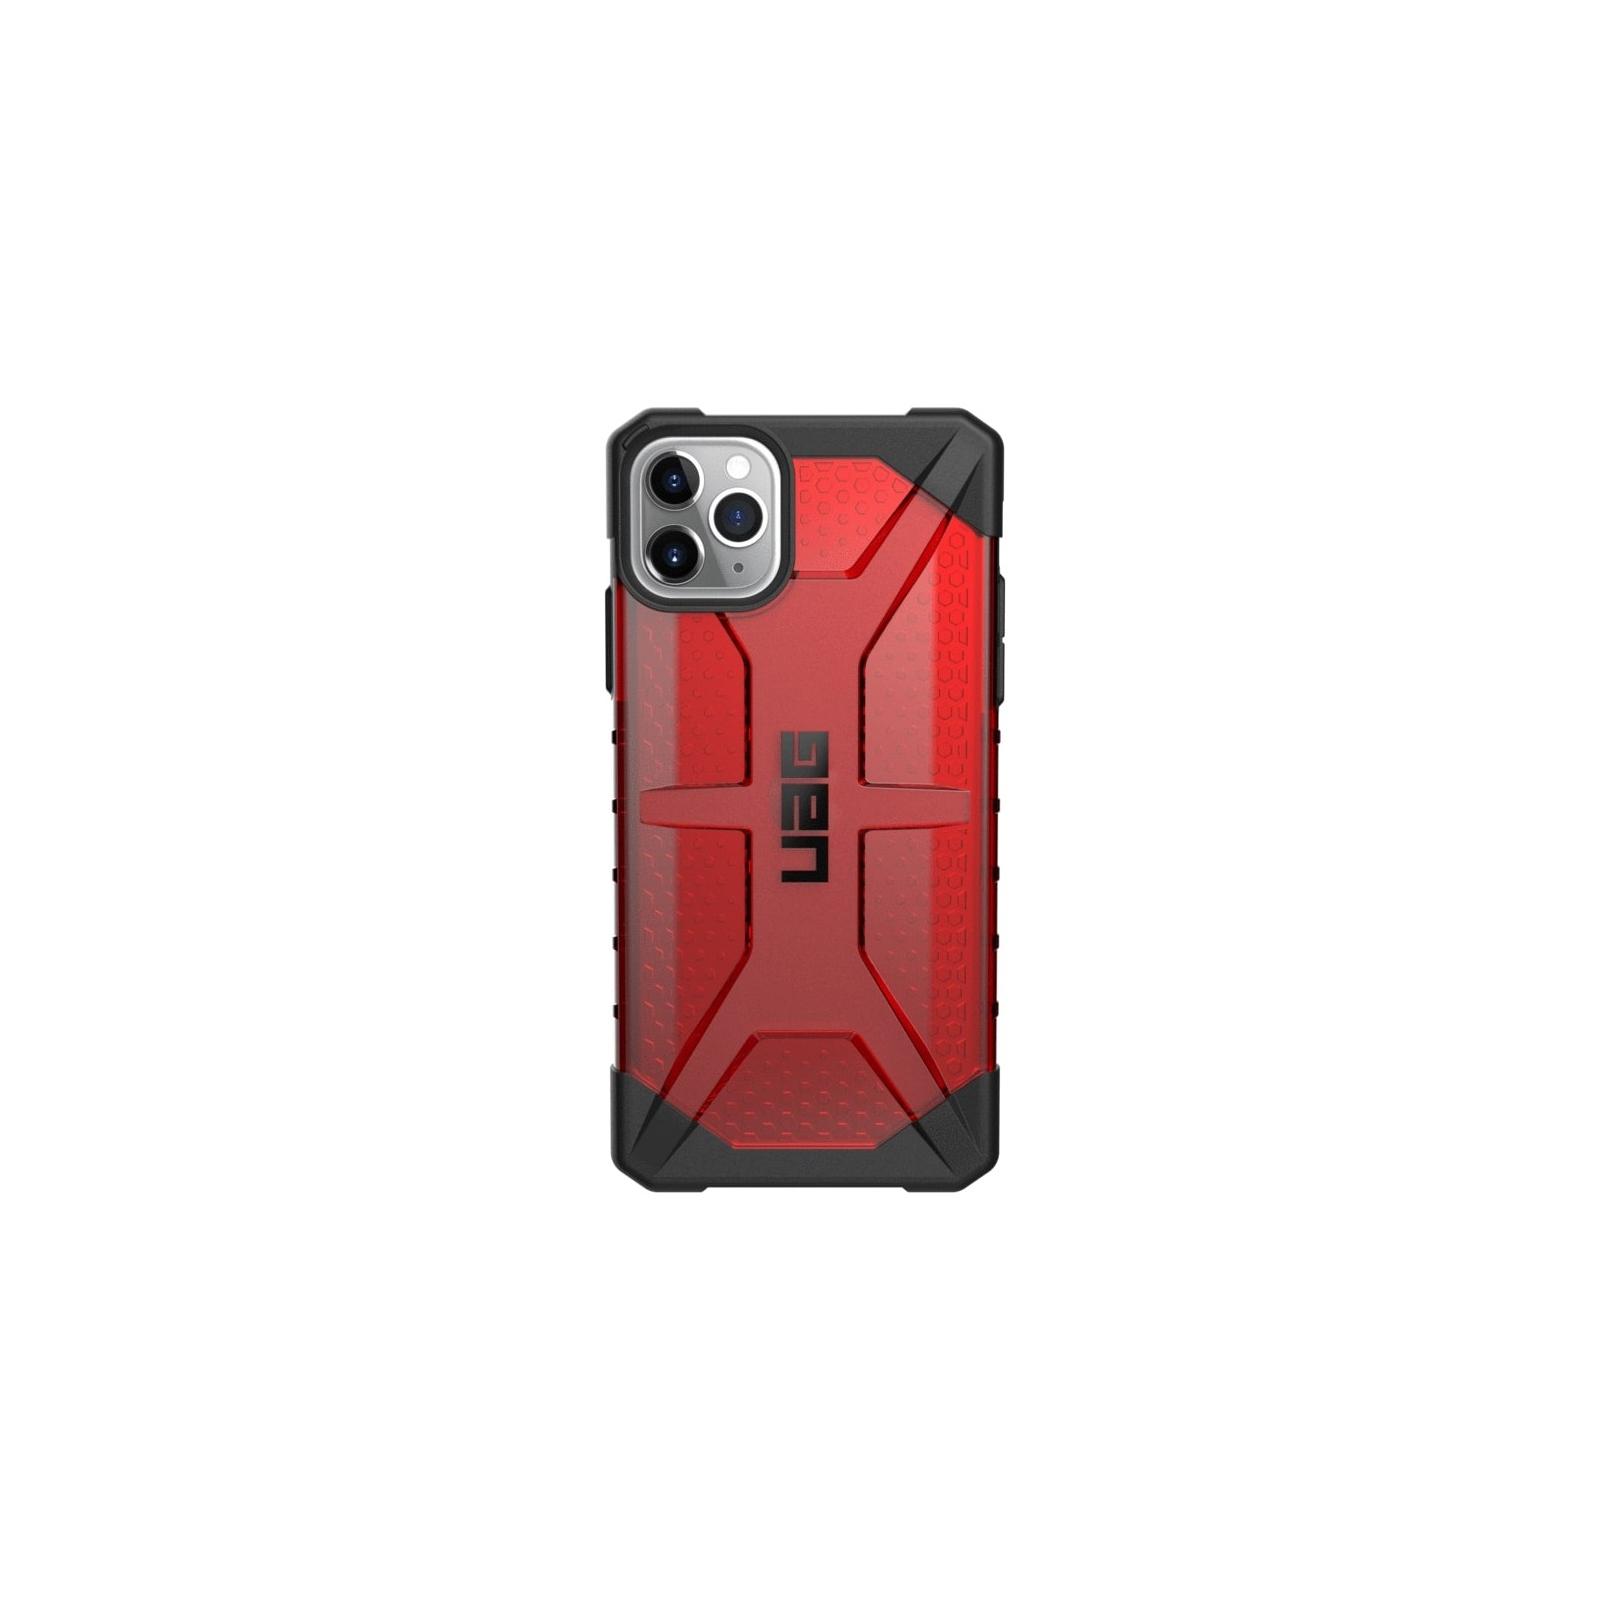 Чехол для моб. телефона Uag iPhone 11 Pro Max Plasma, Magma (111723119393)